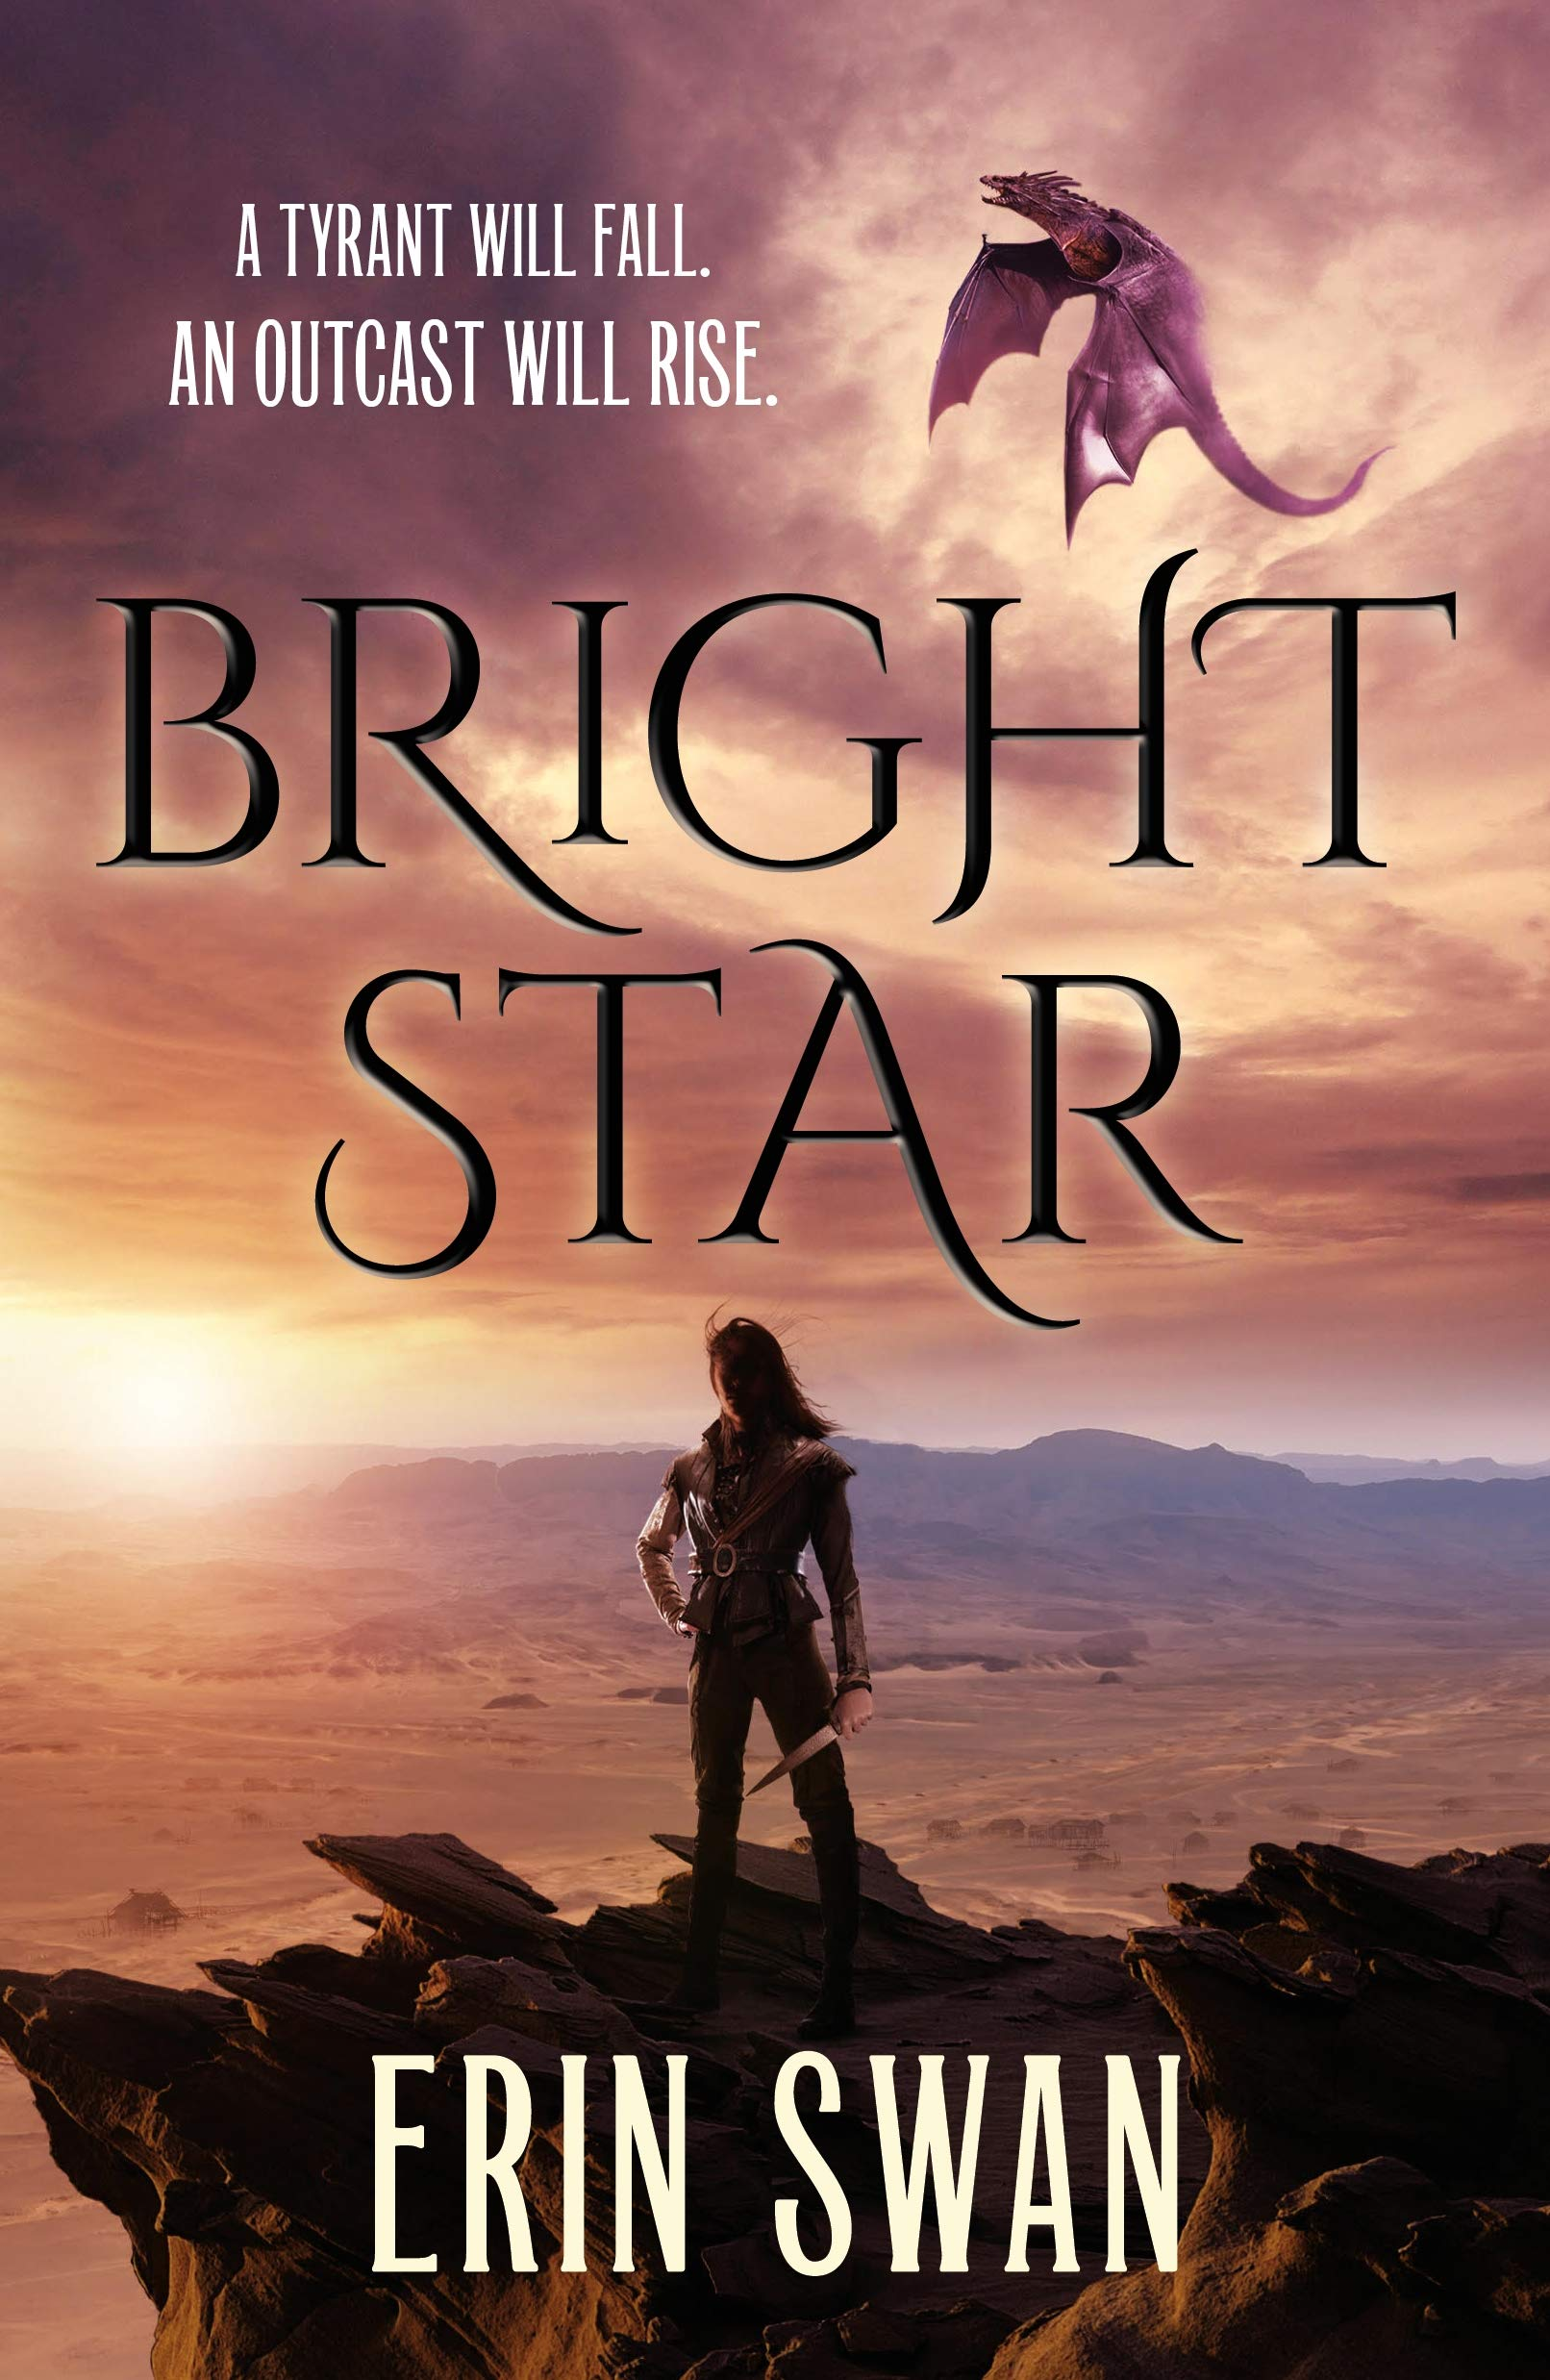 Title:  Bright Star , Author: Erin Swan, Publisher: Tor Teen, Publish Date: August 13, 2019; Genres + Tags: YA, Fantasy, Romance, YA Fantasy Romance, Dragons